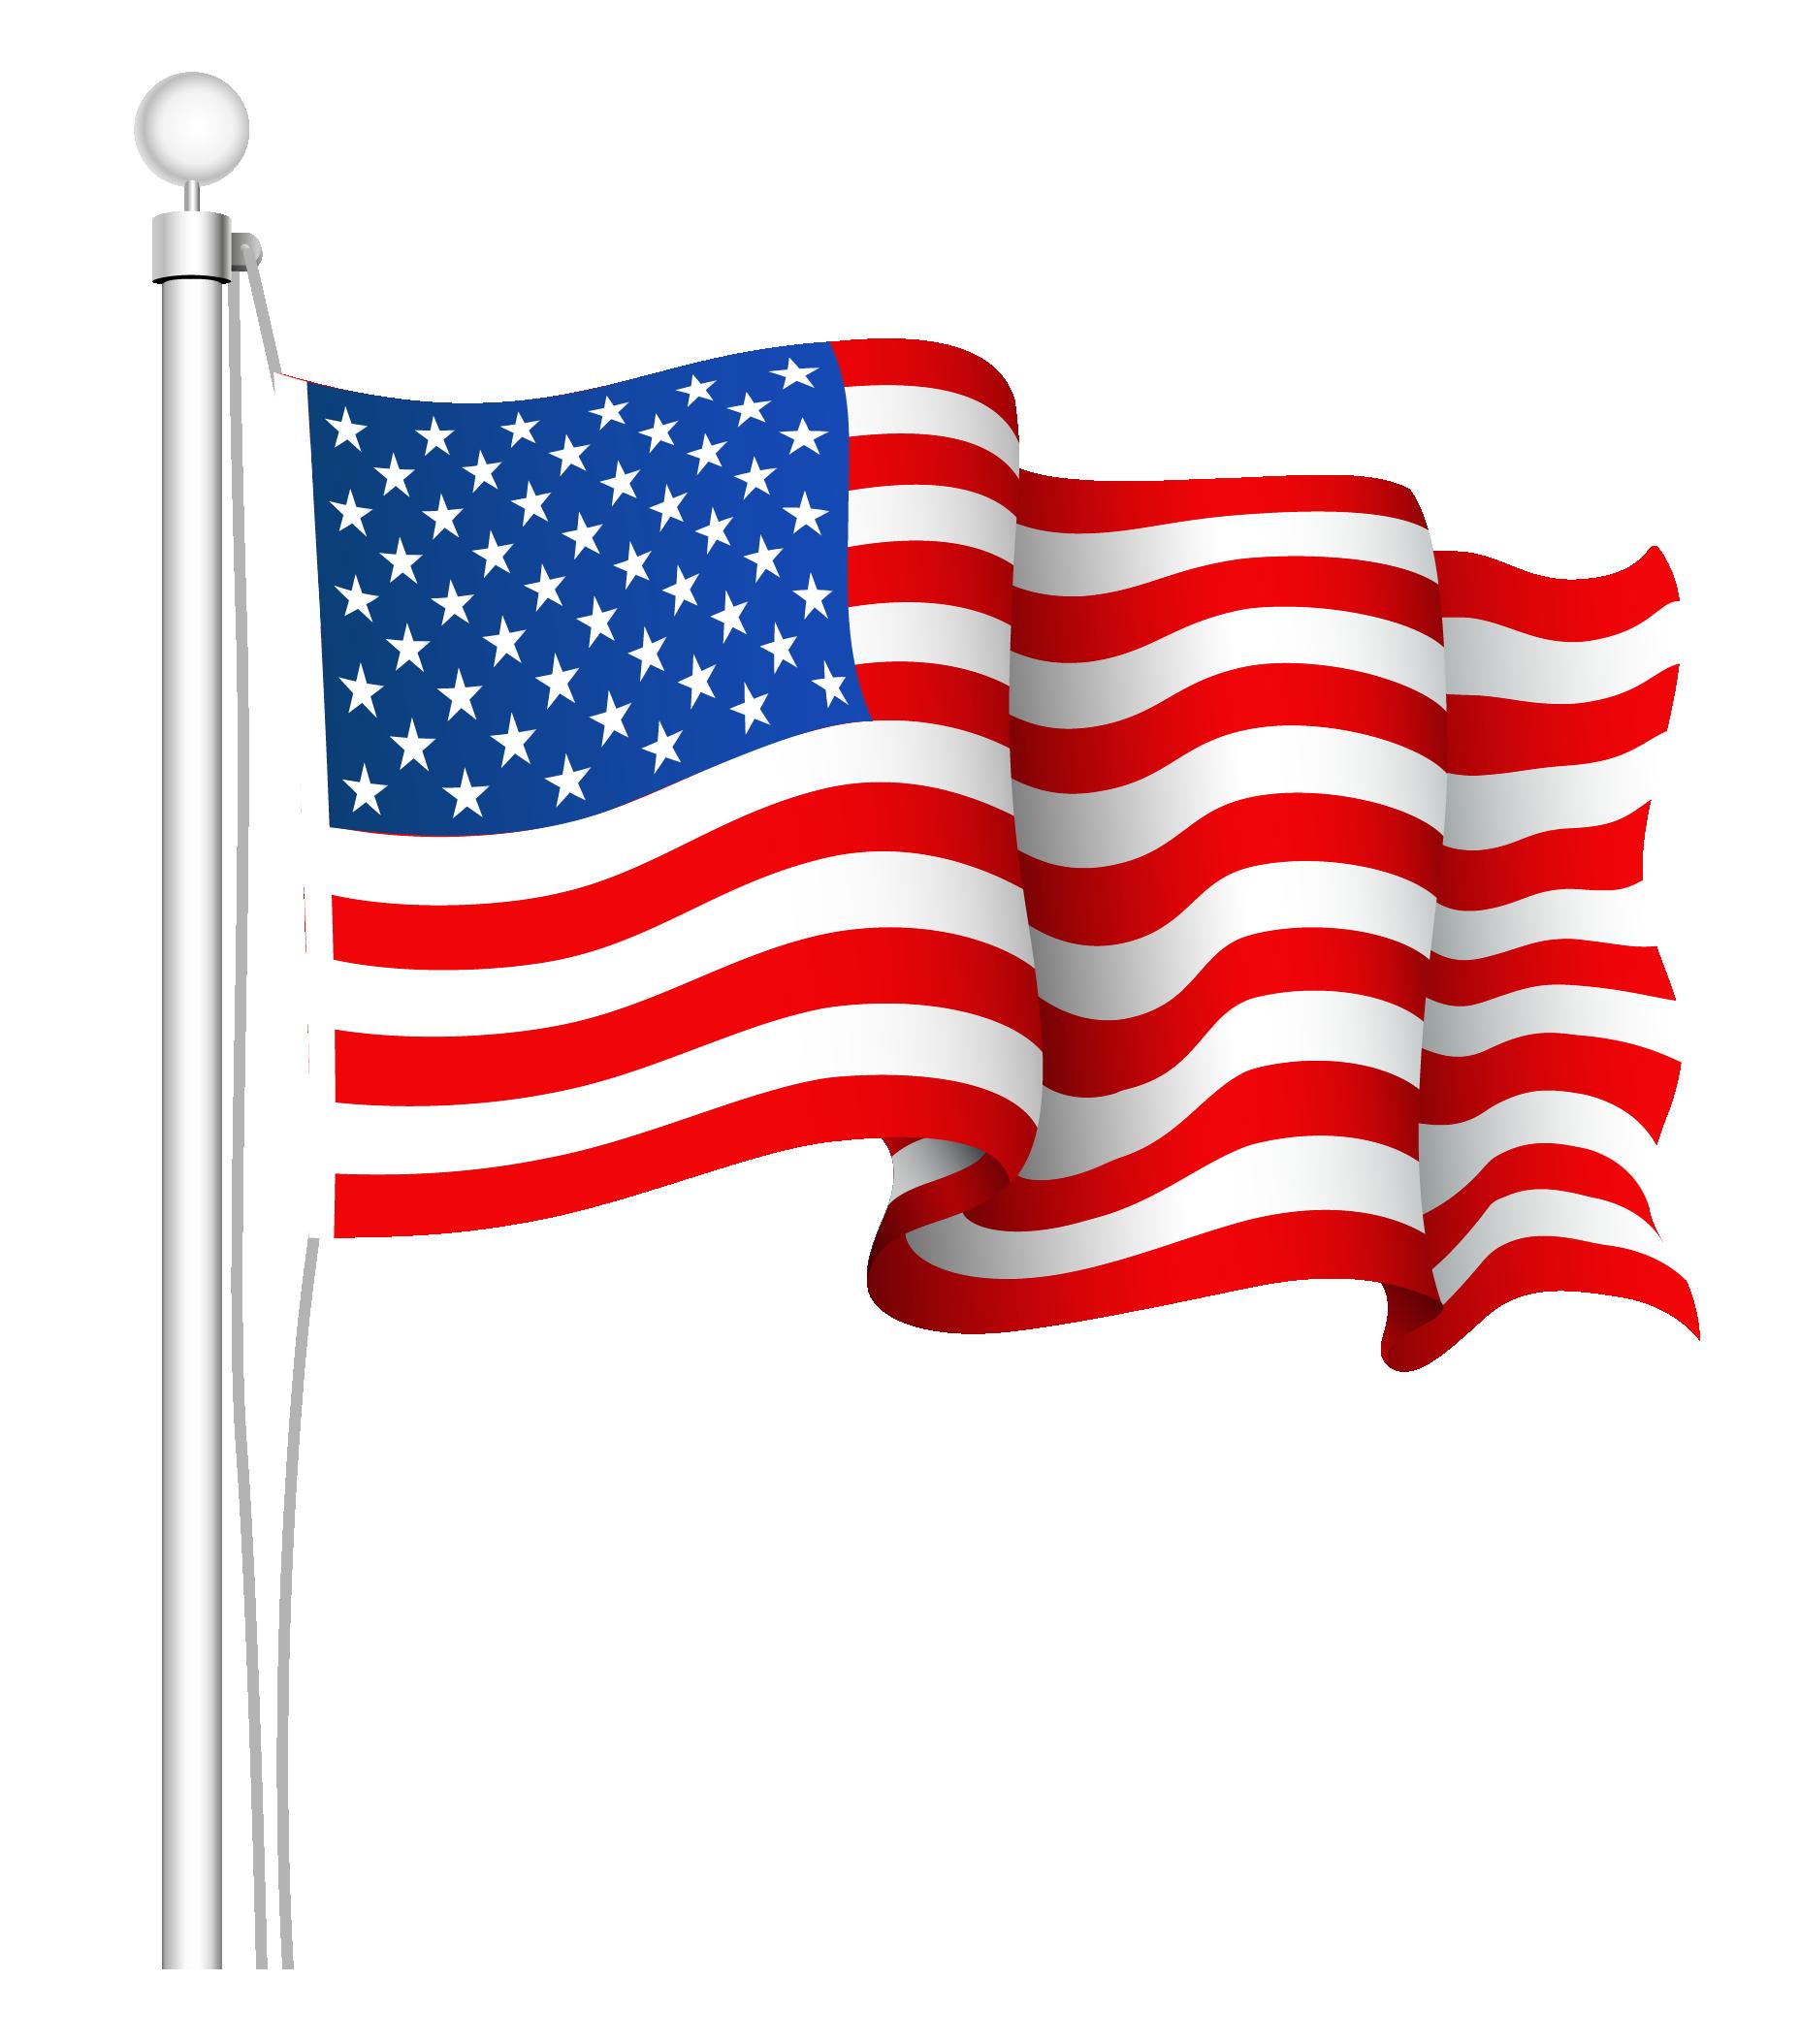 Clip art flag free usa.